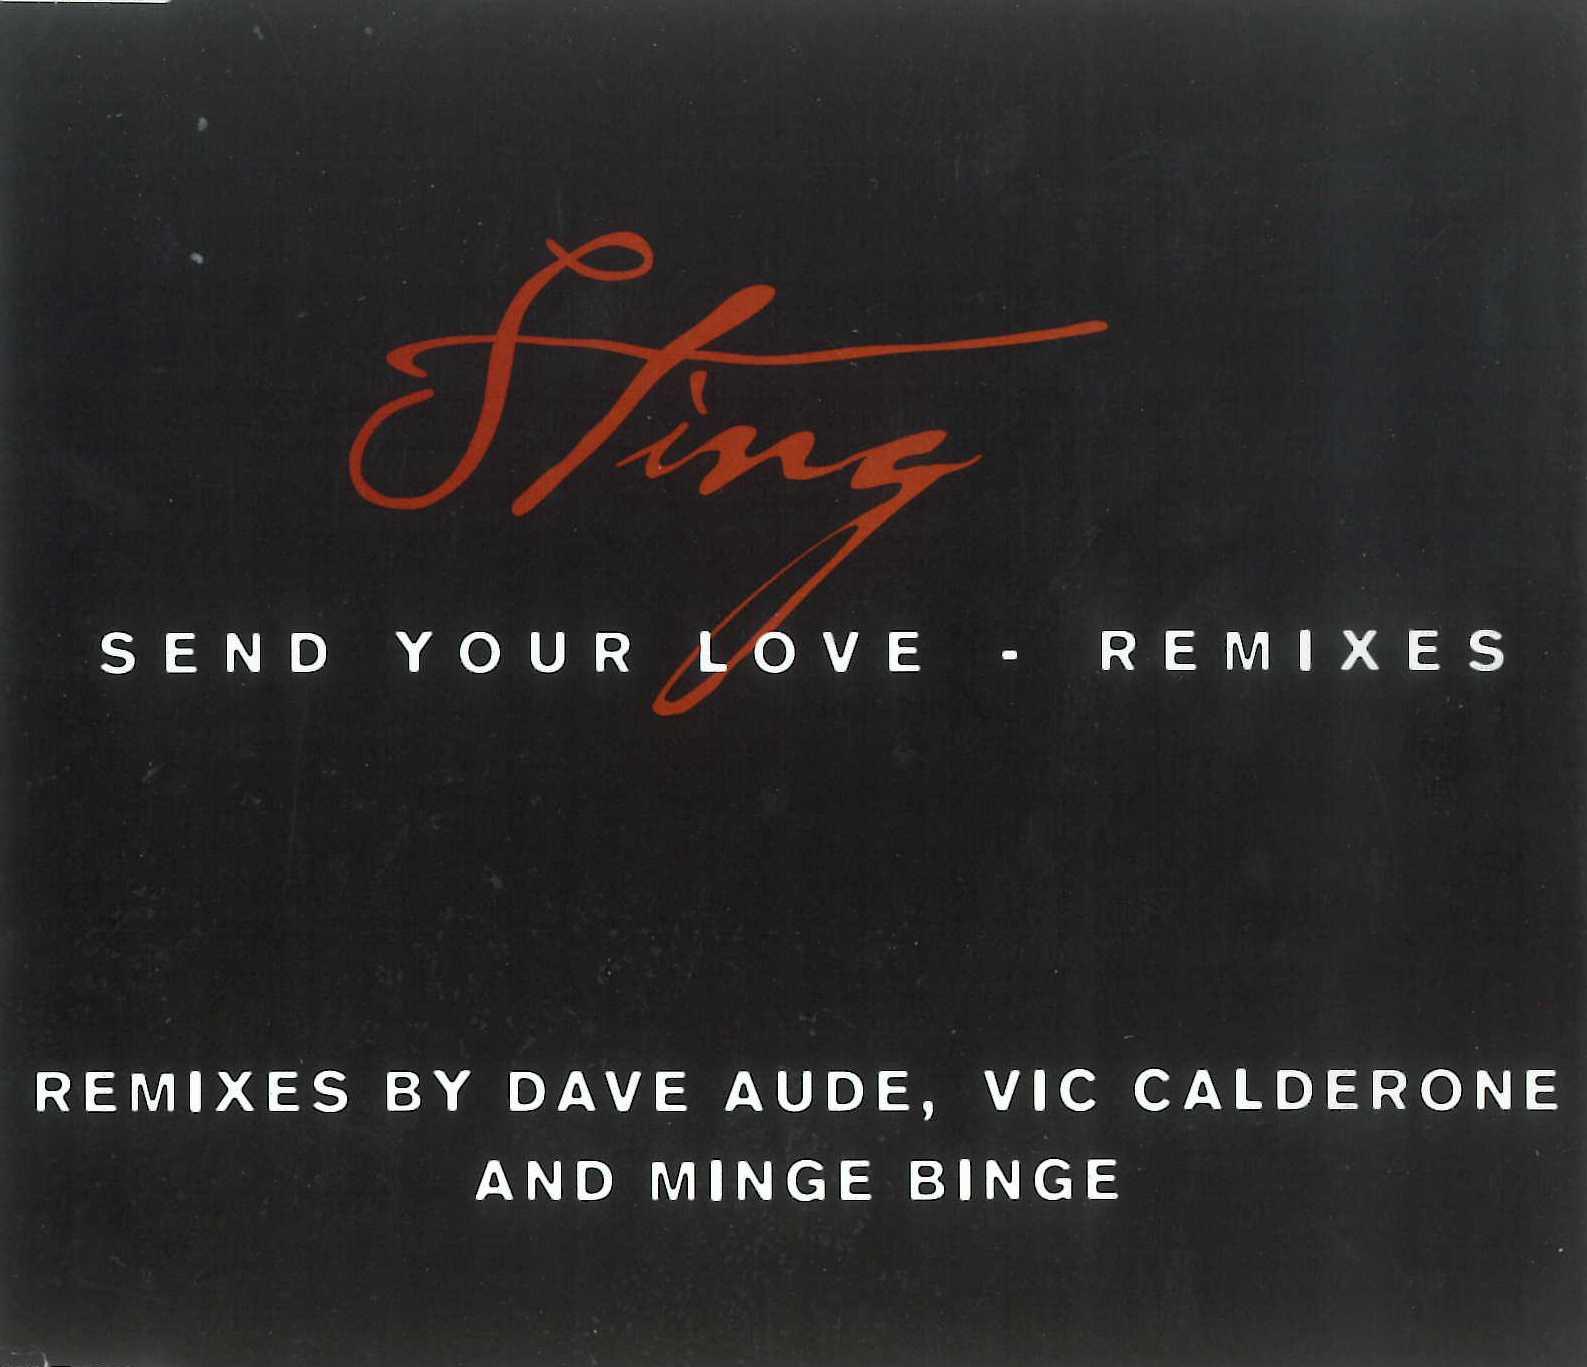 Send your love (Remixes)